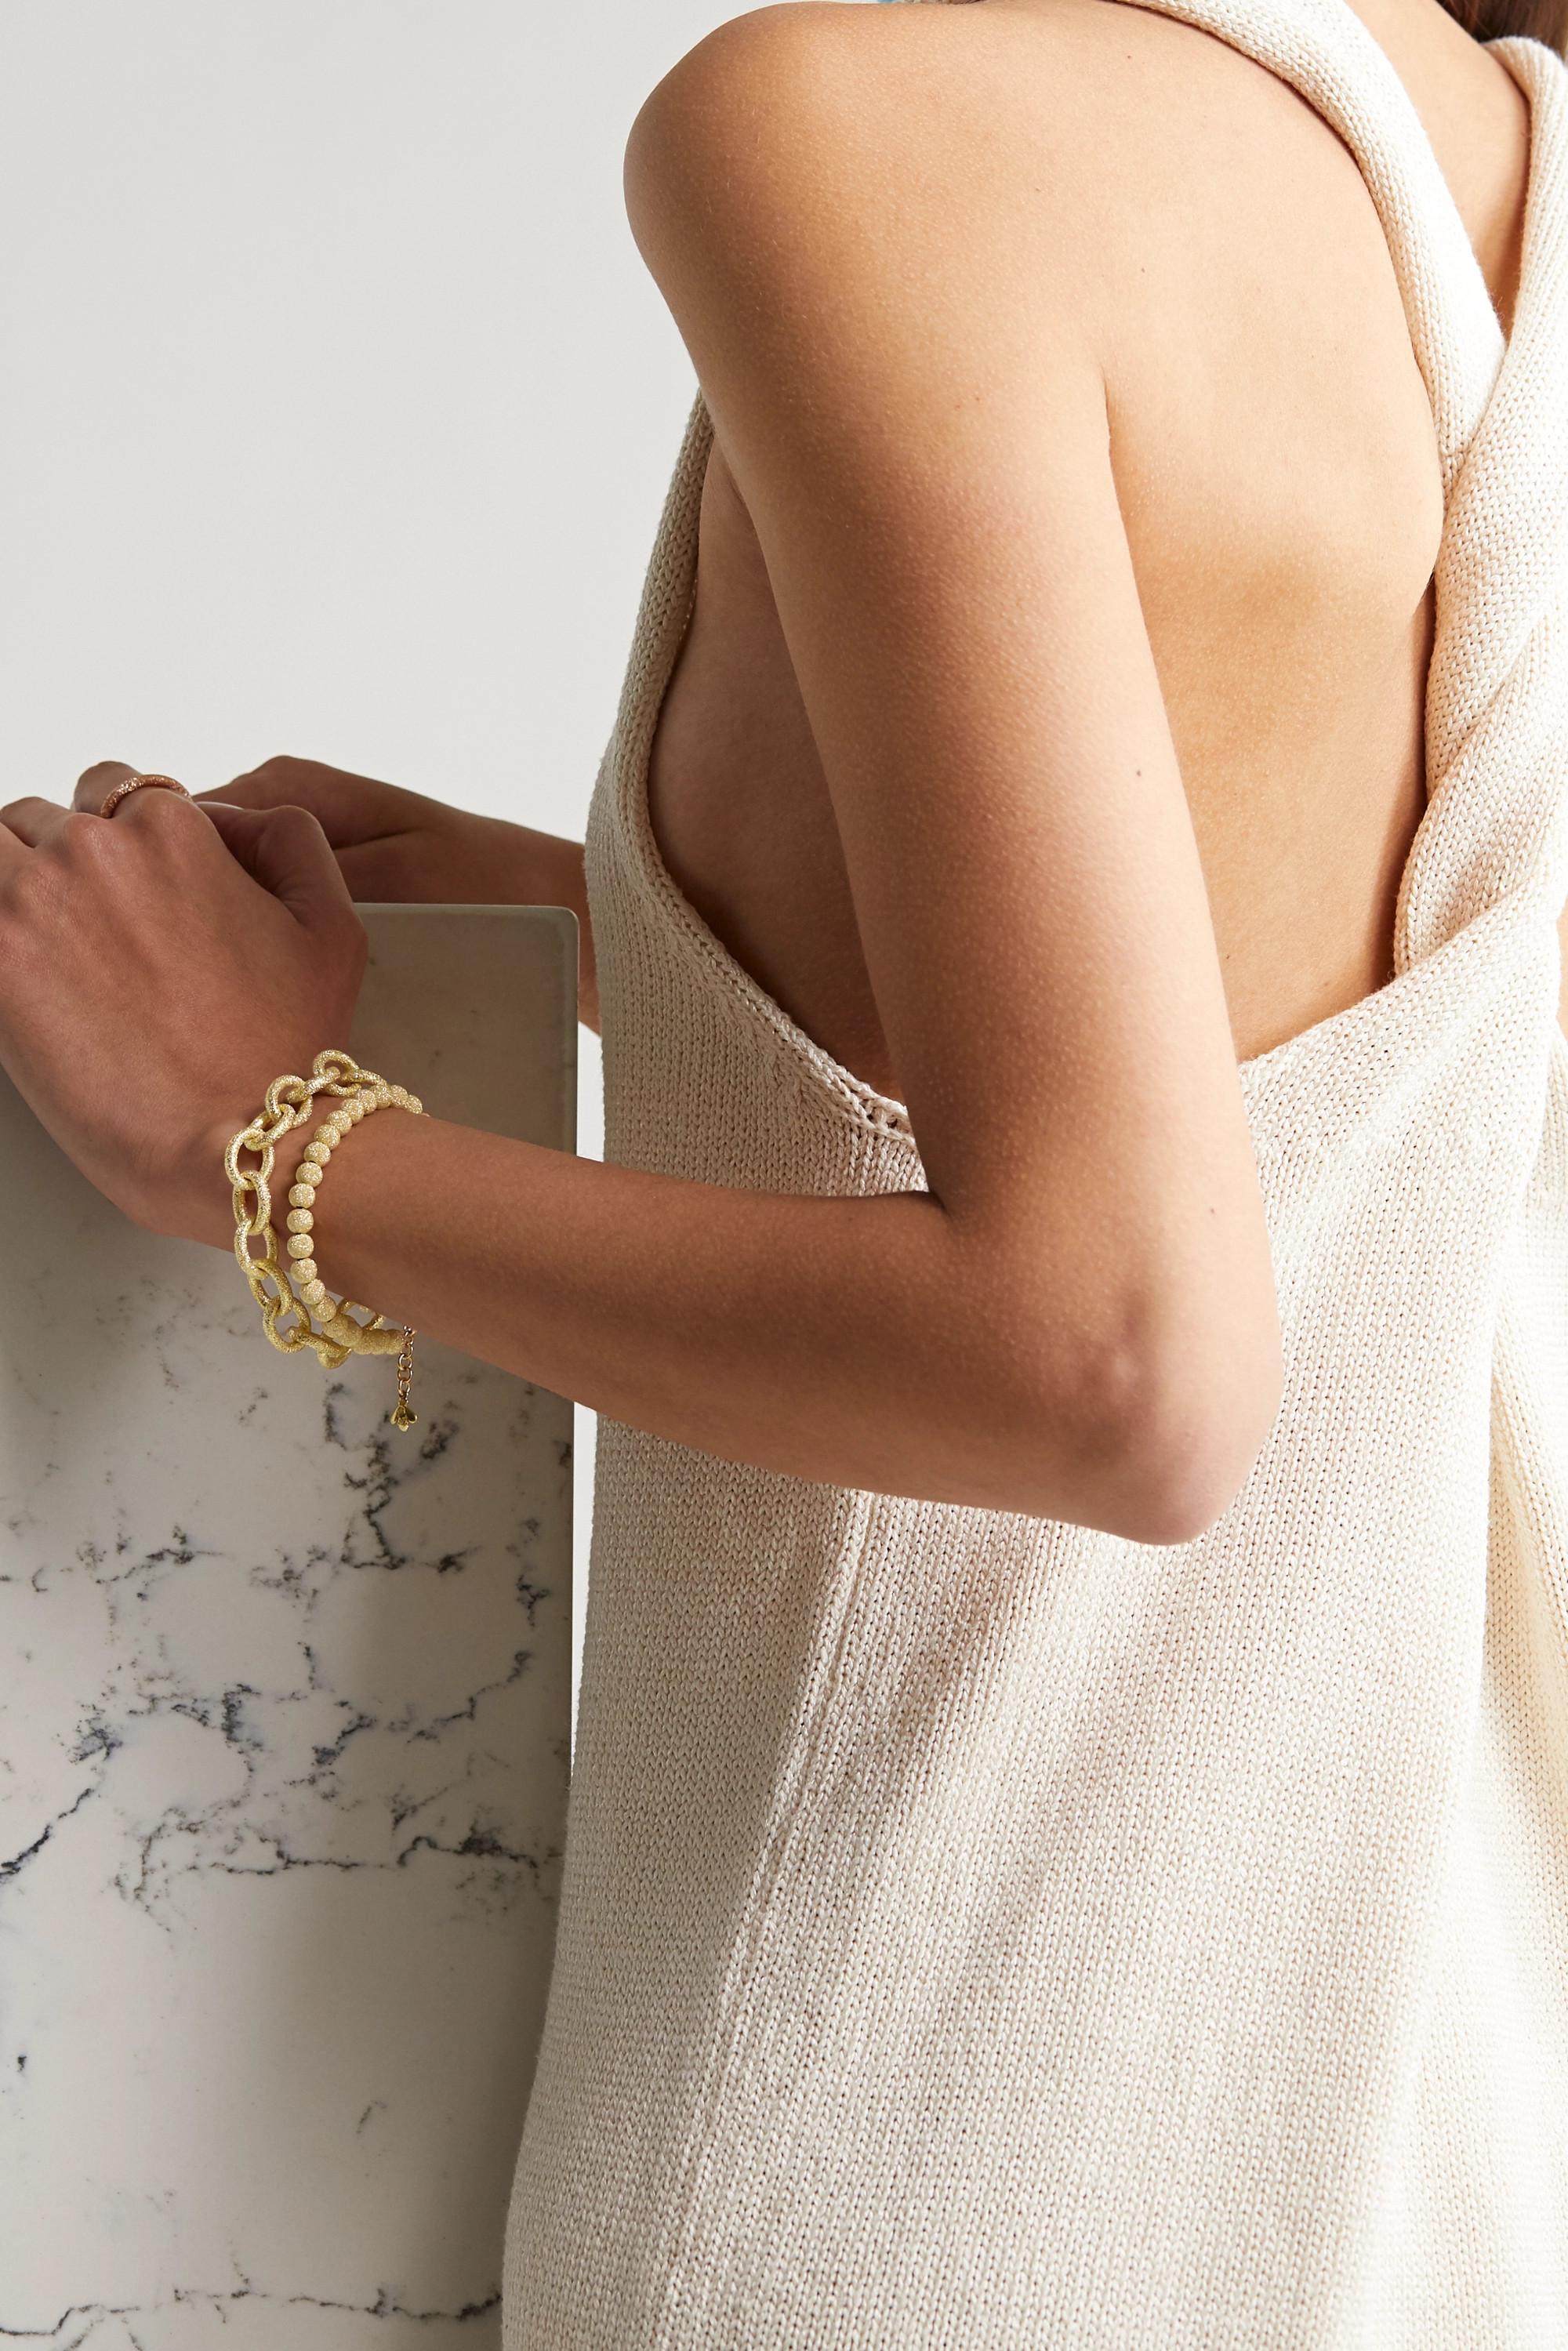 Carolina Bucci Florentine Armband aus 18 Karat Gold